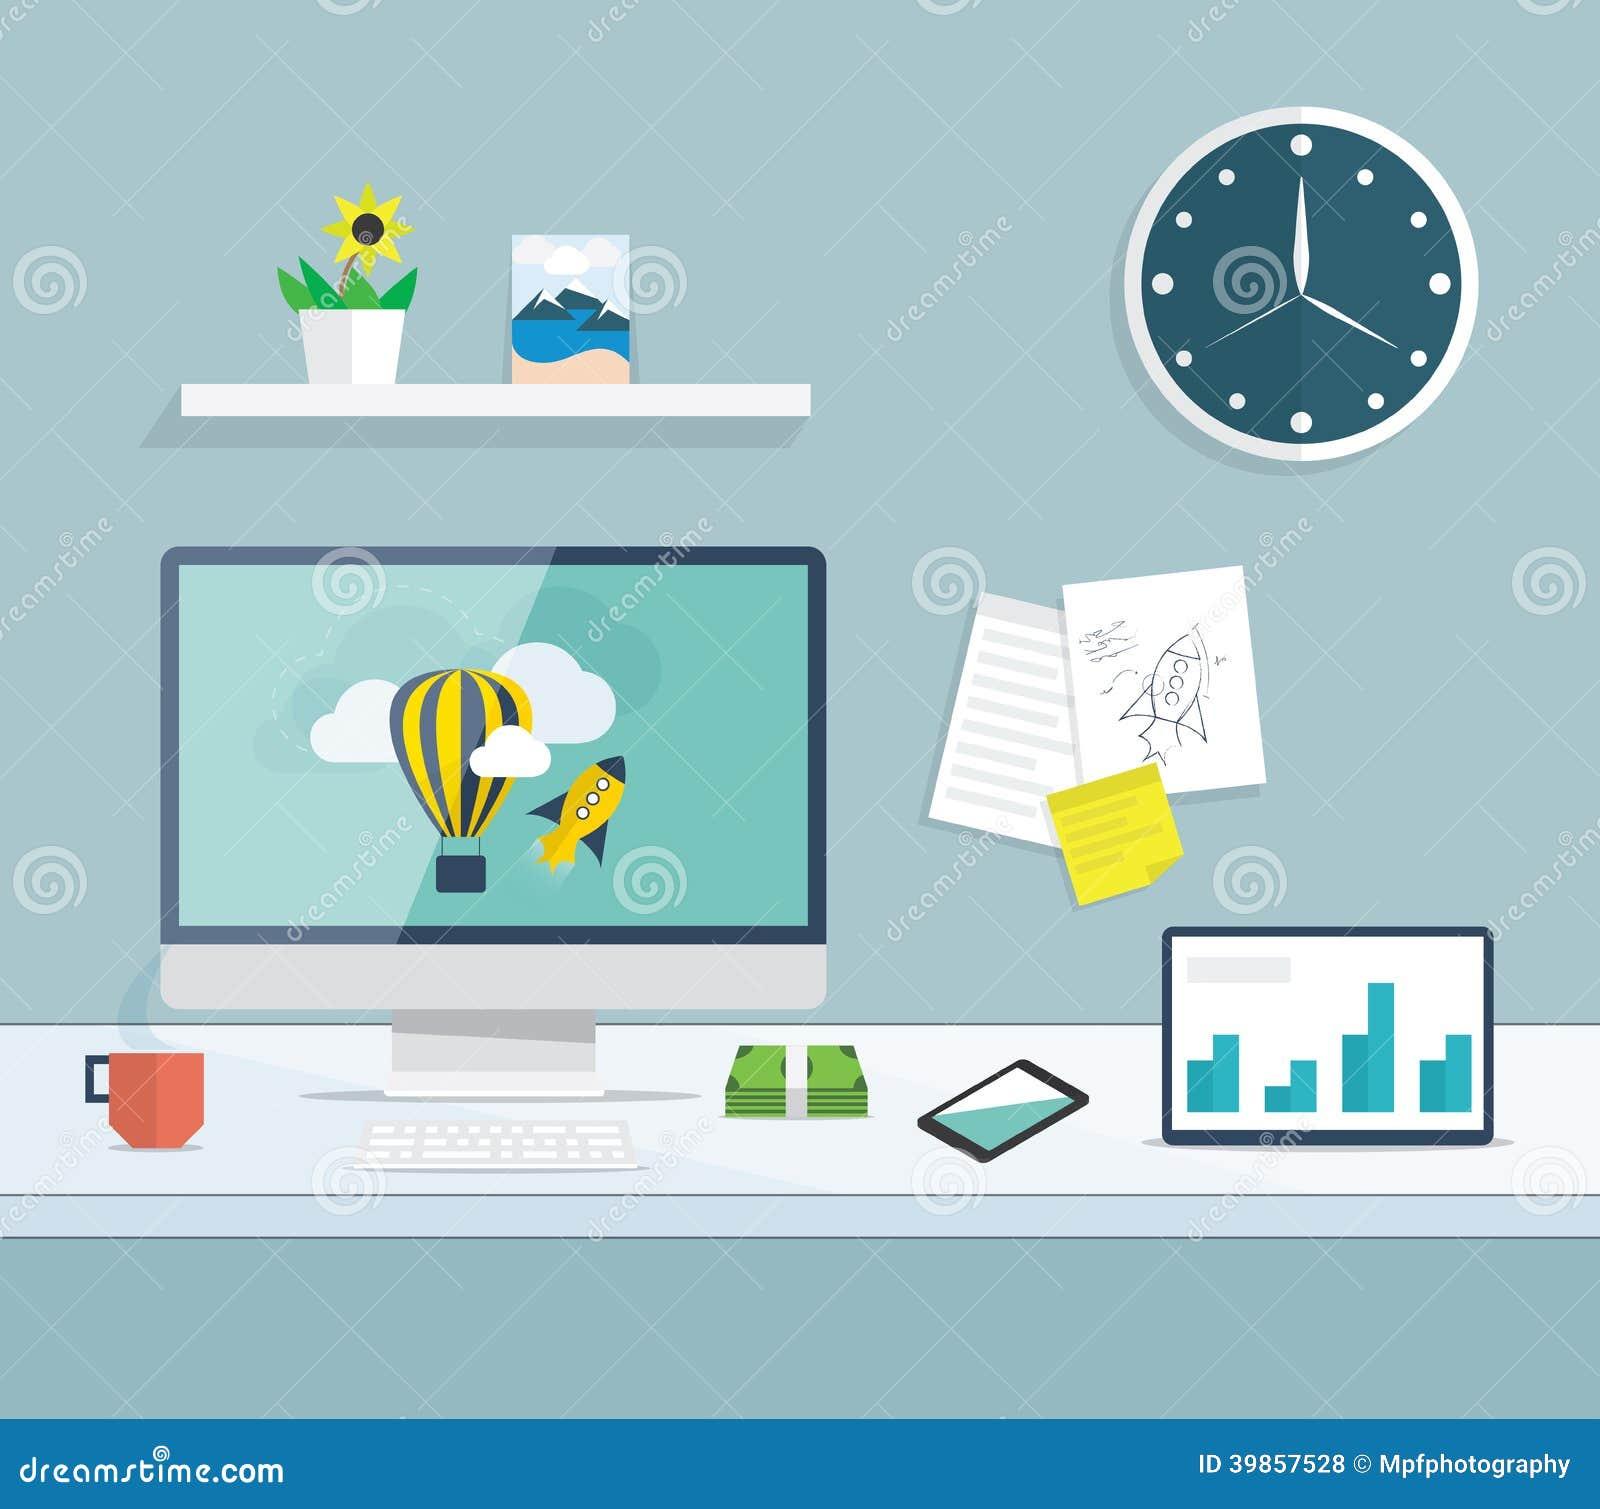 Flat Desktop Of Web And Graphic Design Development Stock